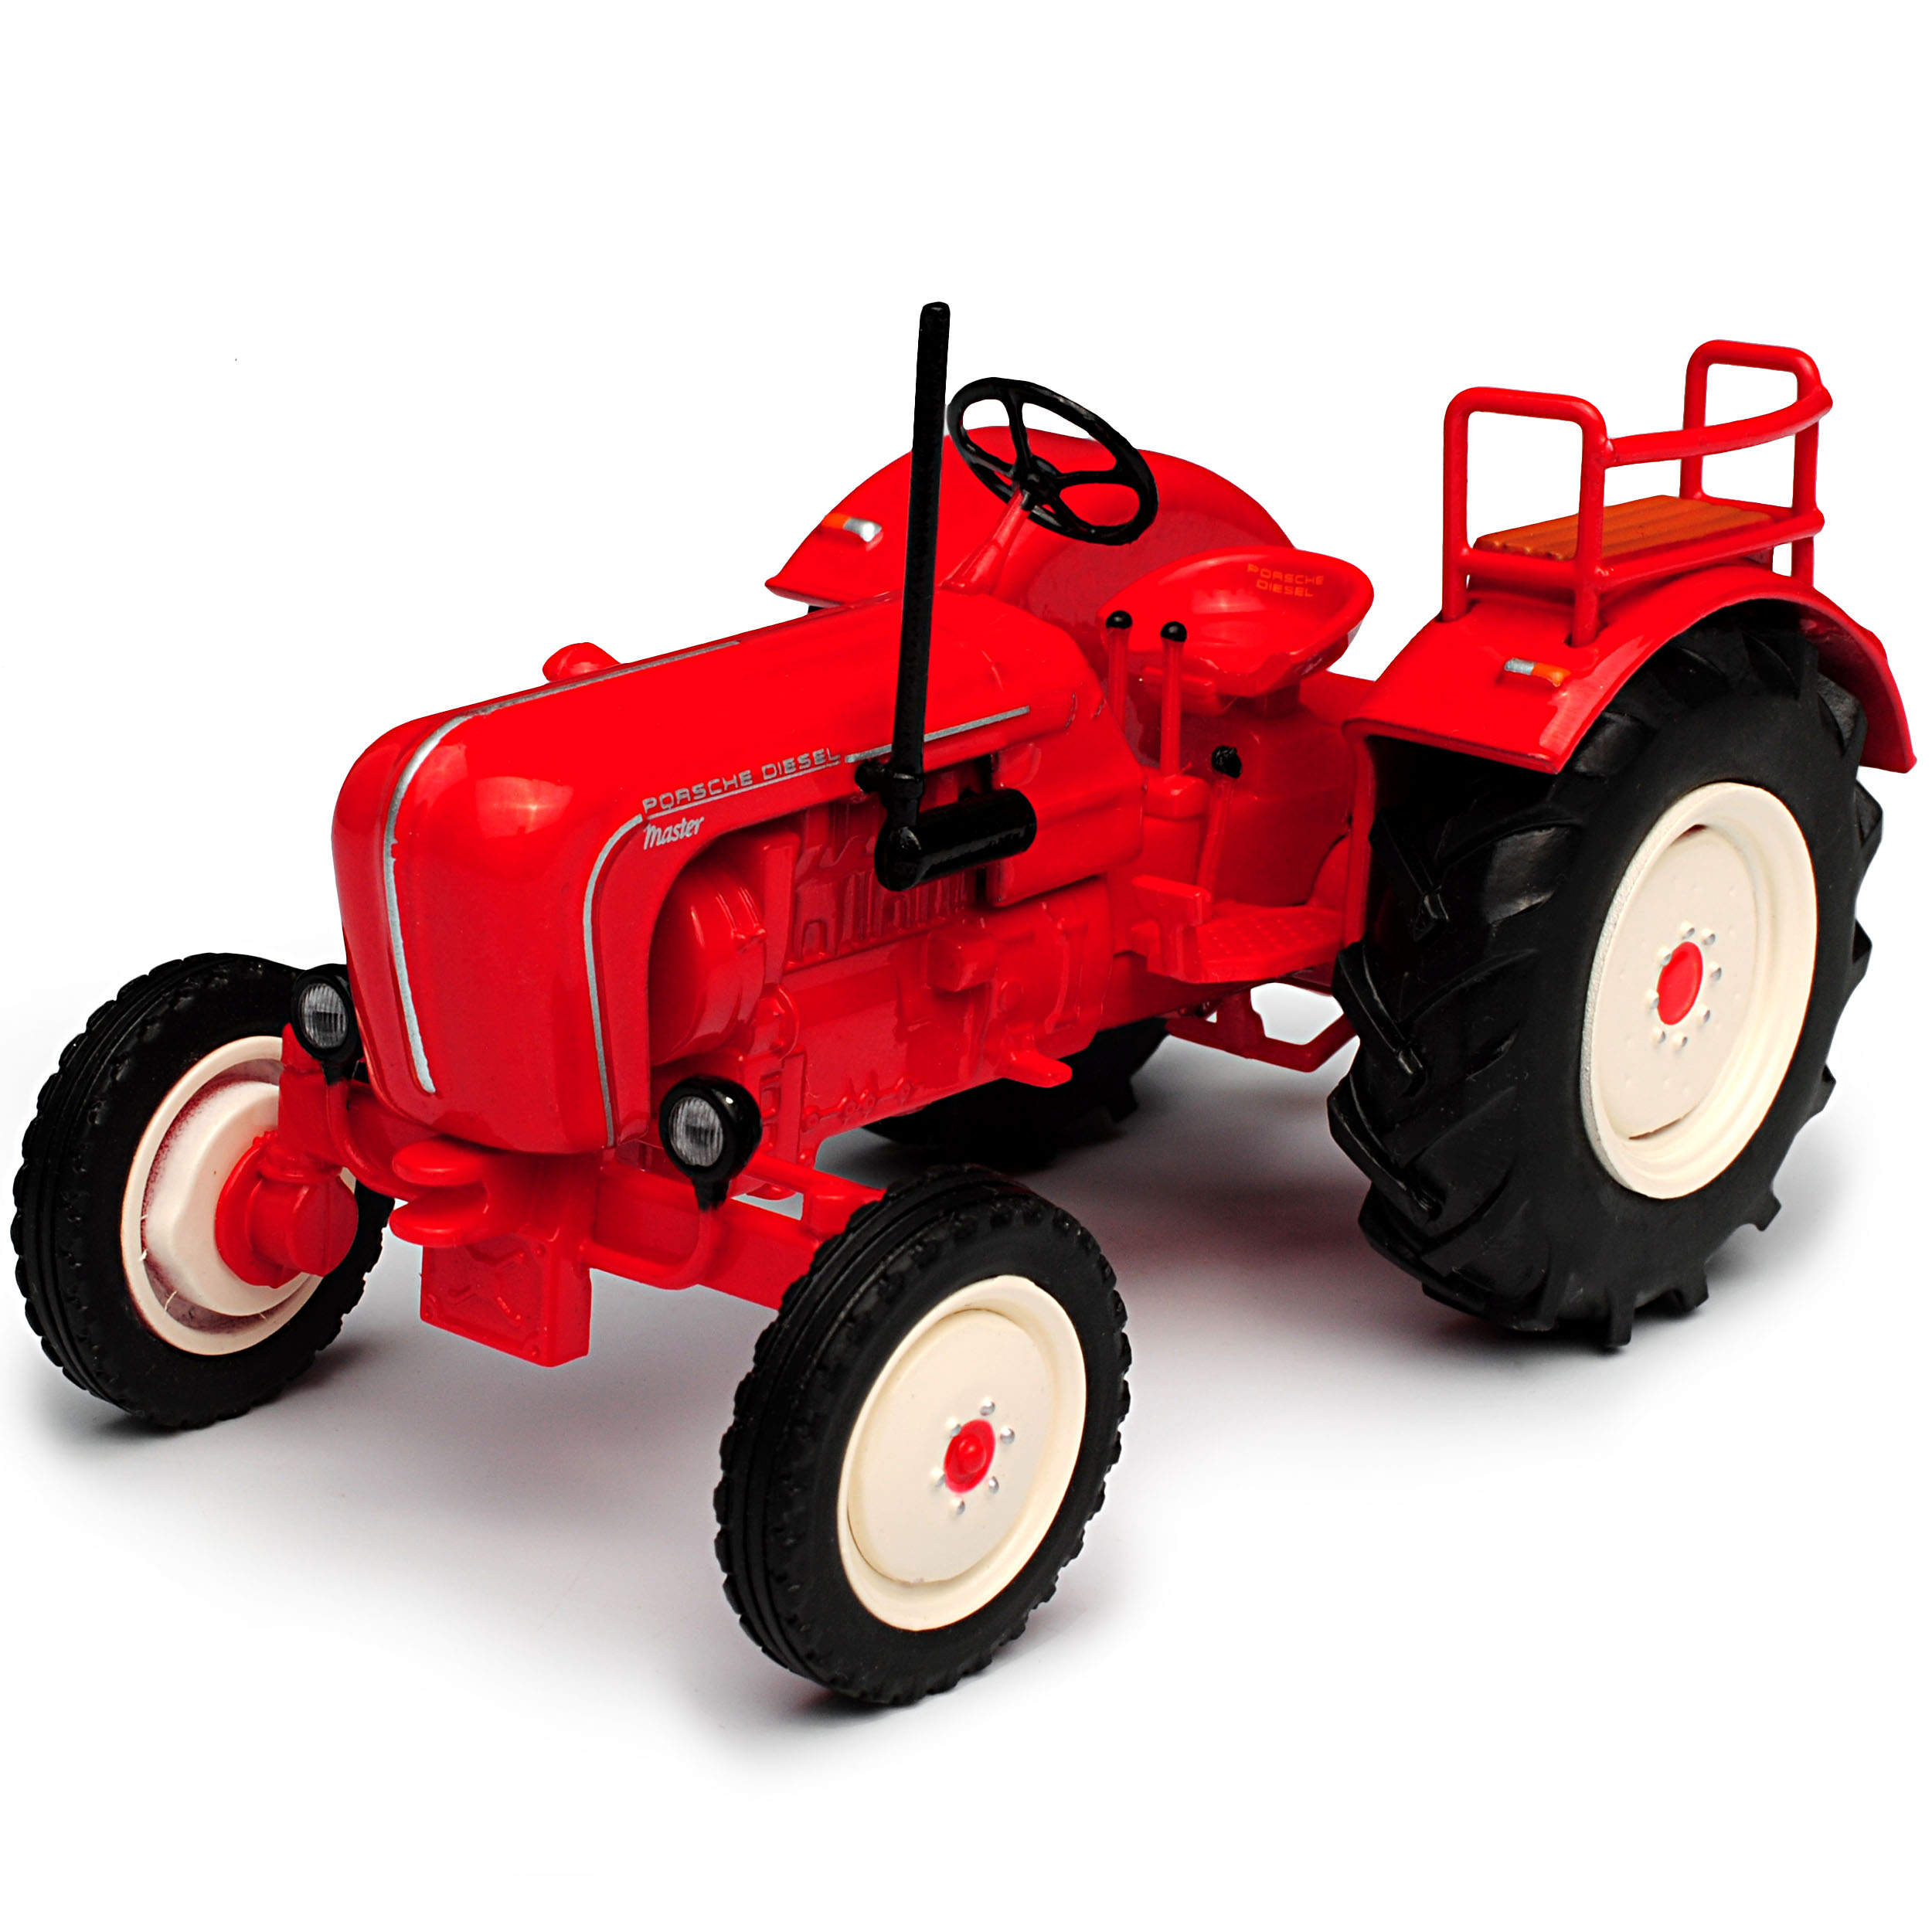 Porsche diesel Master n419 1962 Tractor Rojo 1 43 43 43 Ixo Premiumx modelo coche con... 0de253